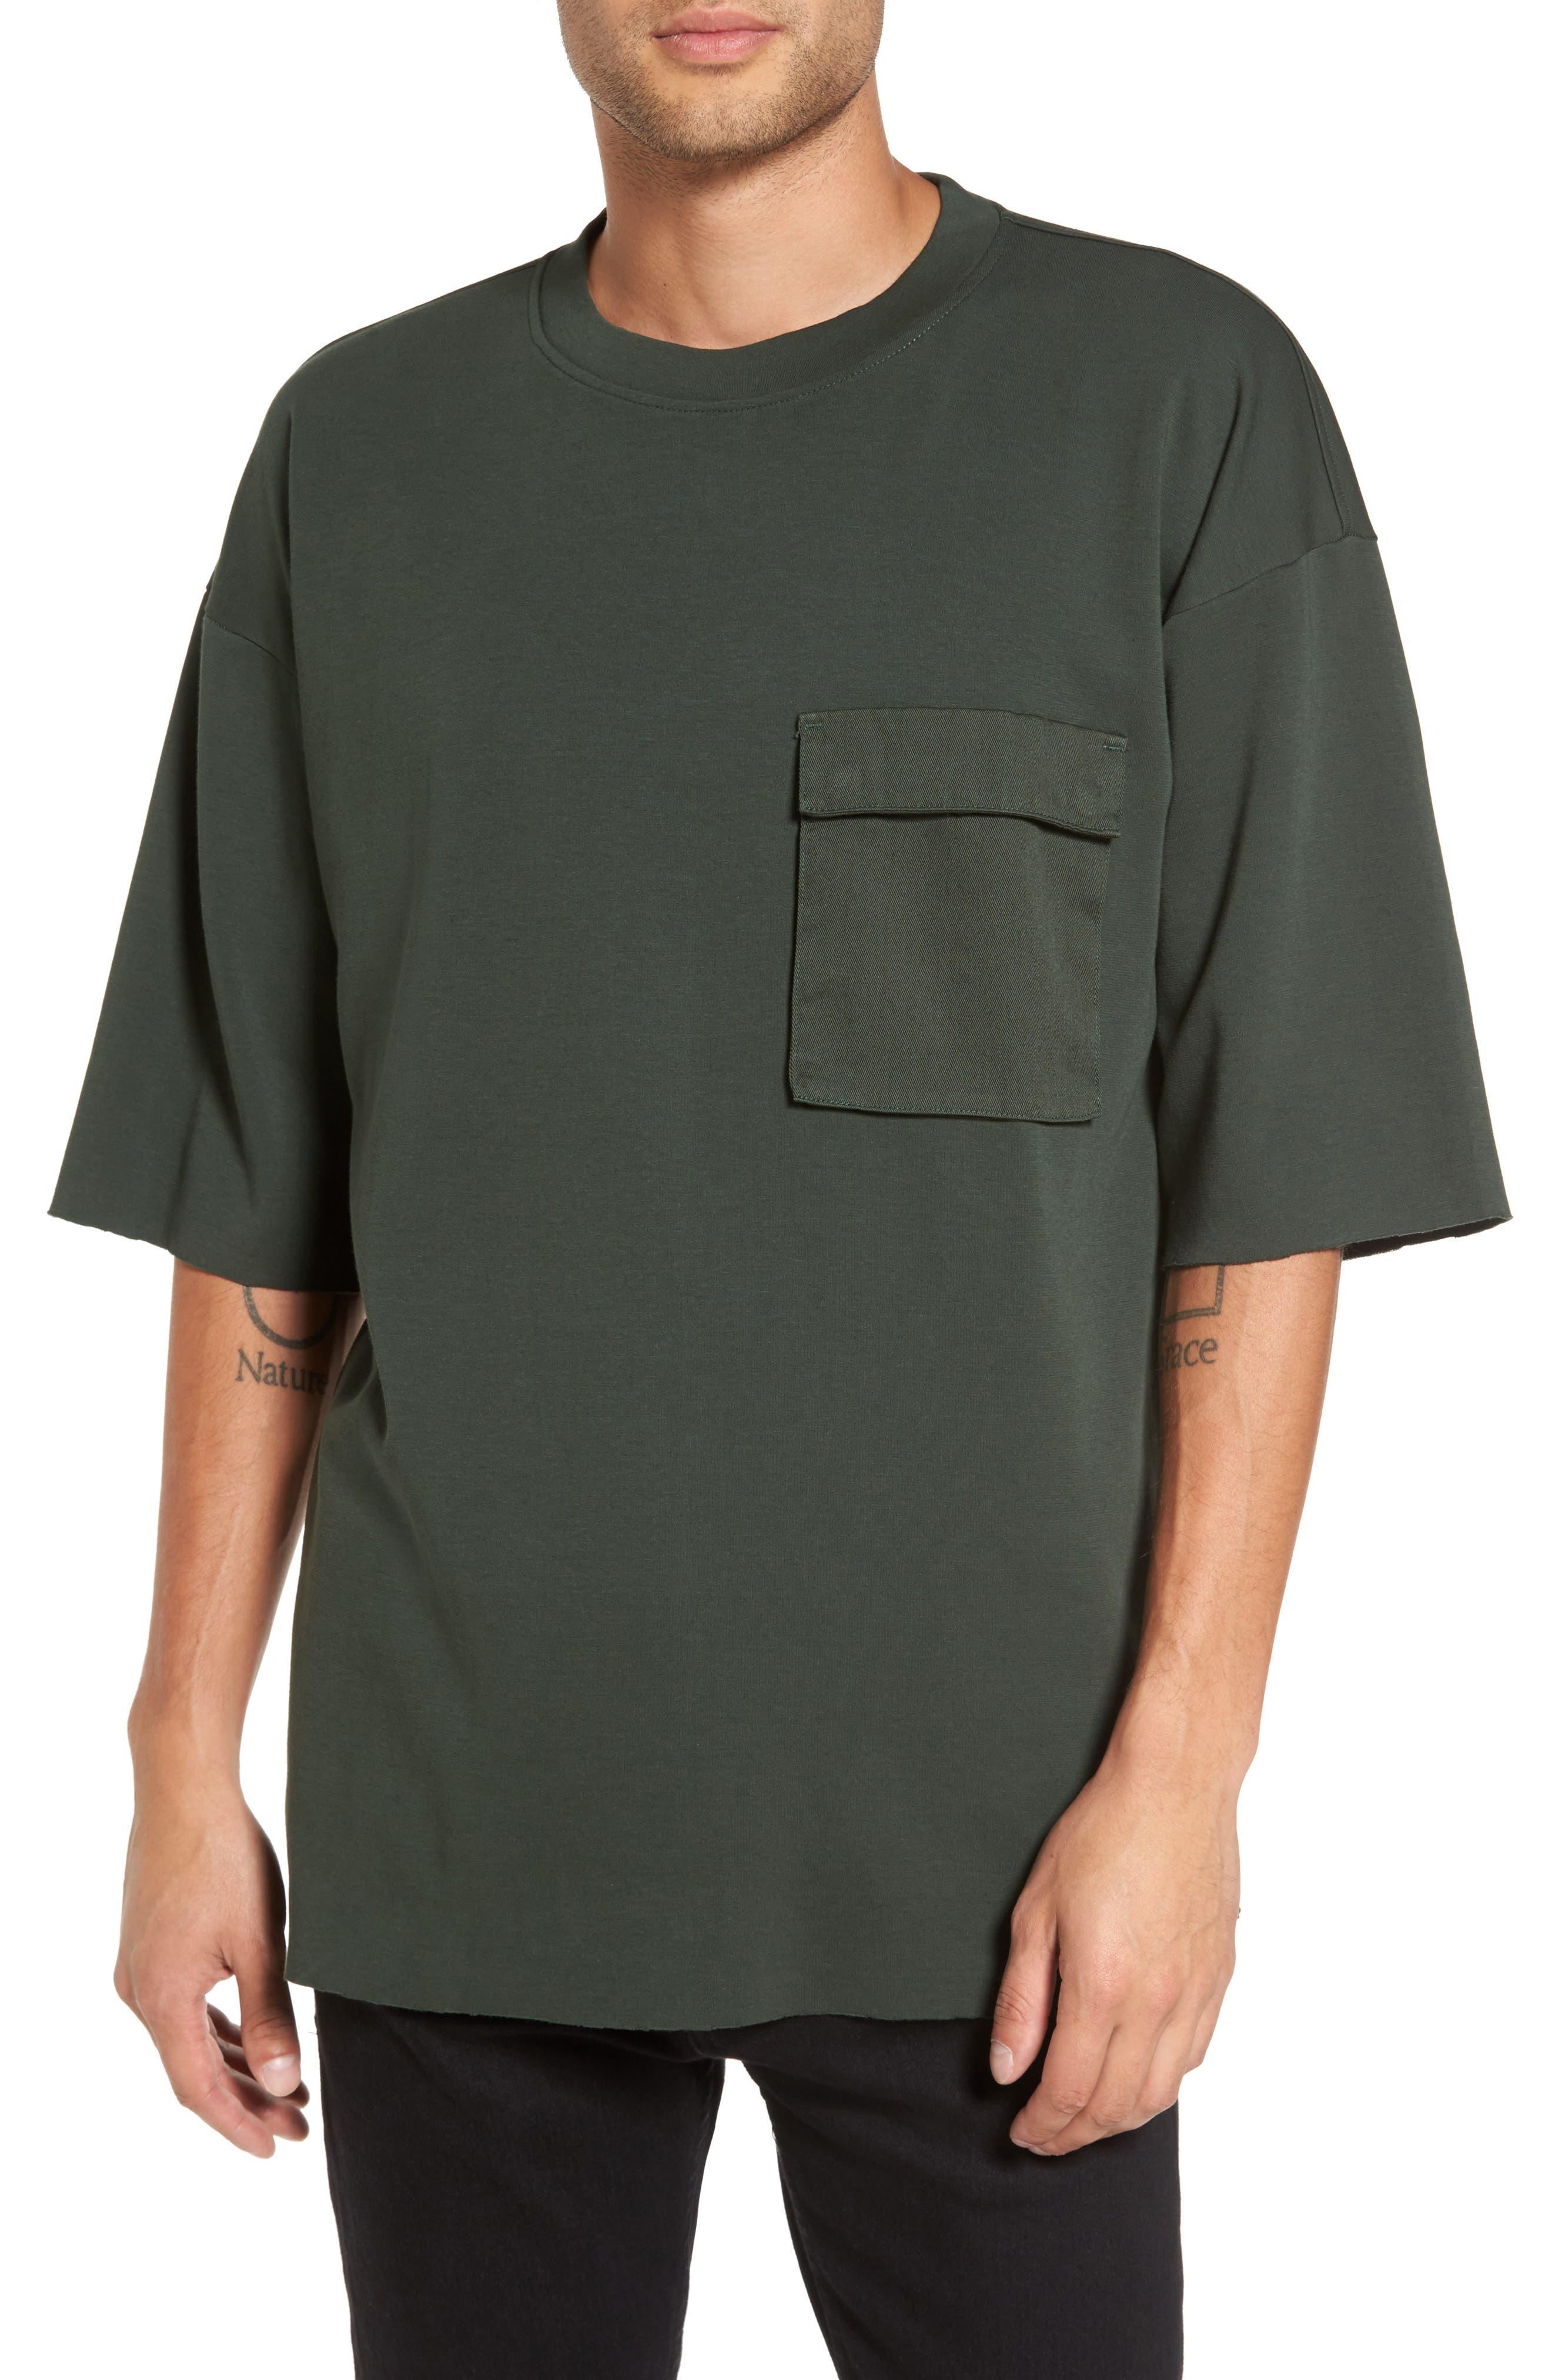 Main Image - Dr. Denim Supply Co. Mauno Pocket T-Shirt